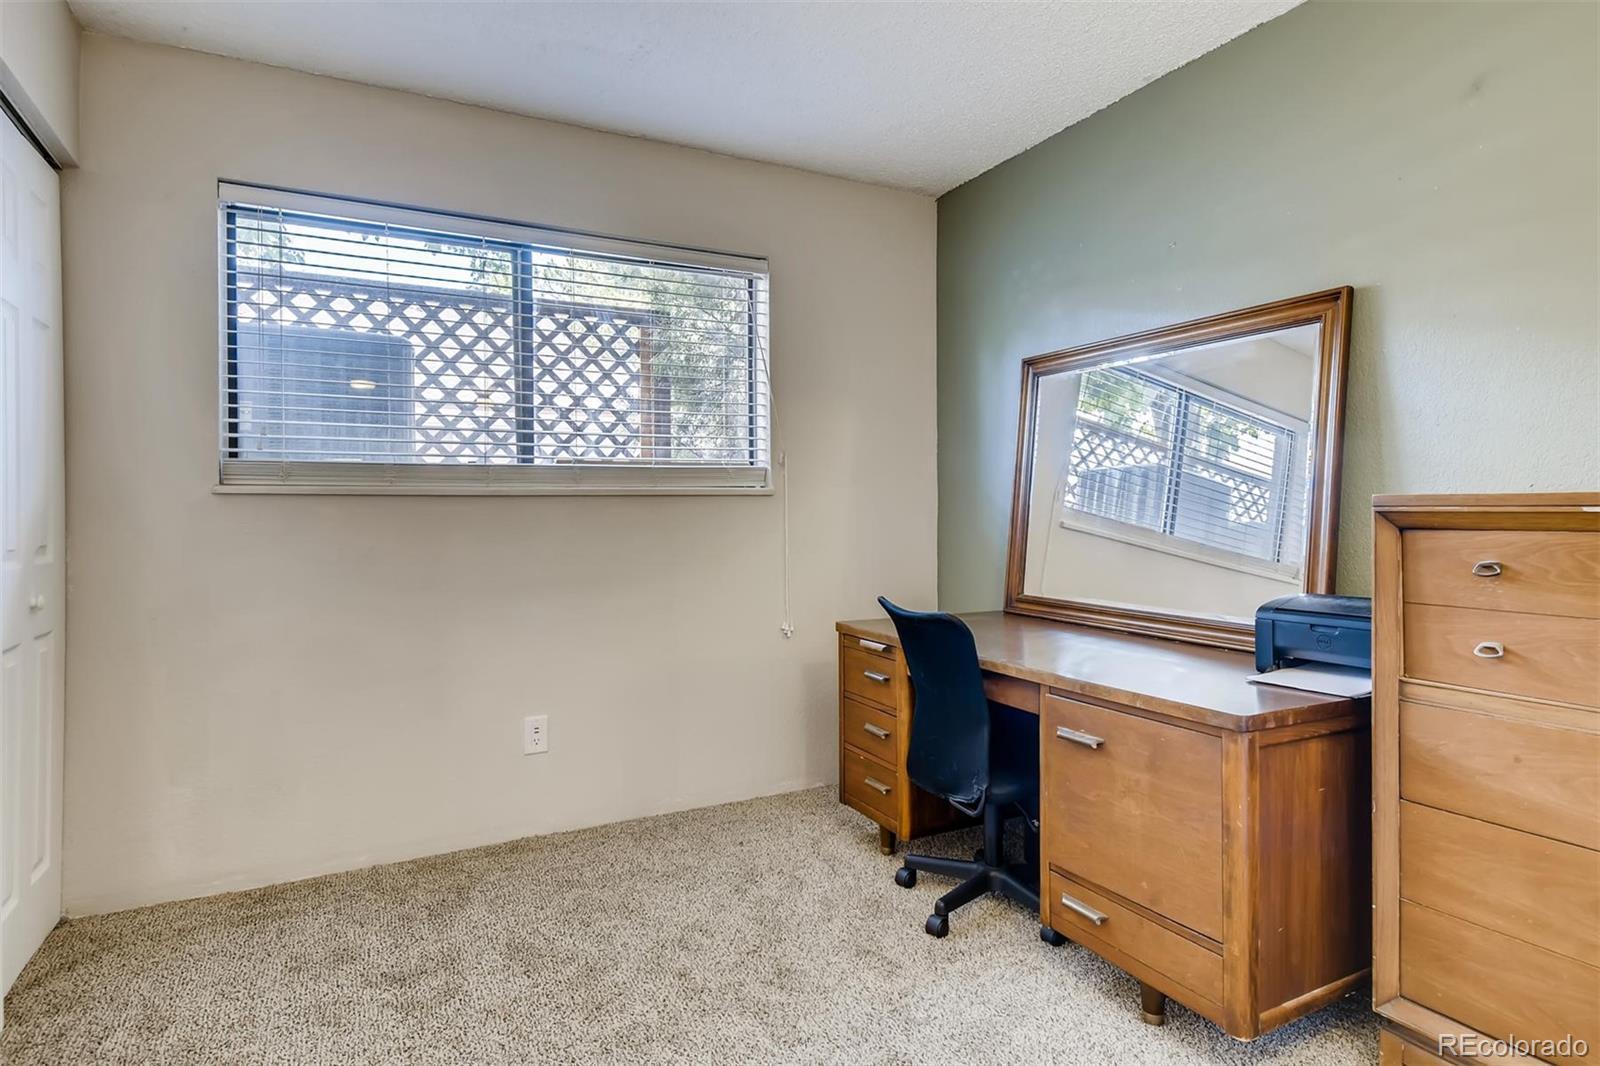 MLS# 3625998 - 14 - 416 Wright Street #103, Lakewood, CO 80228